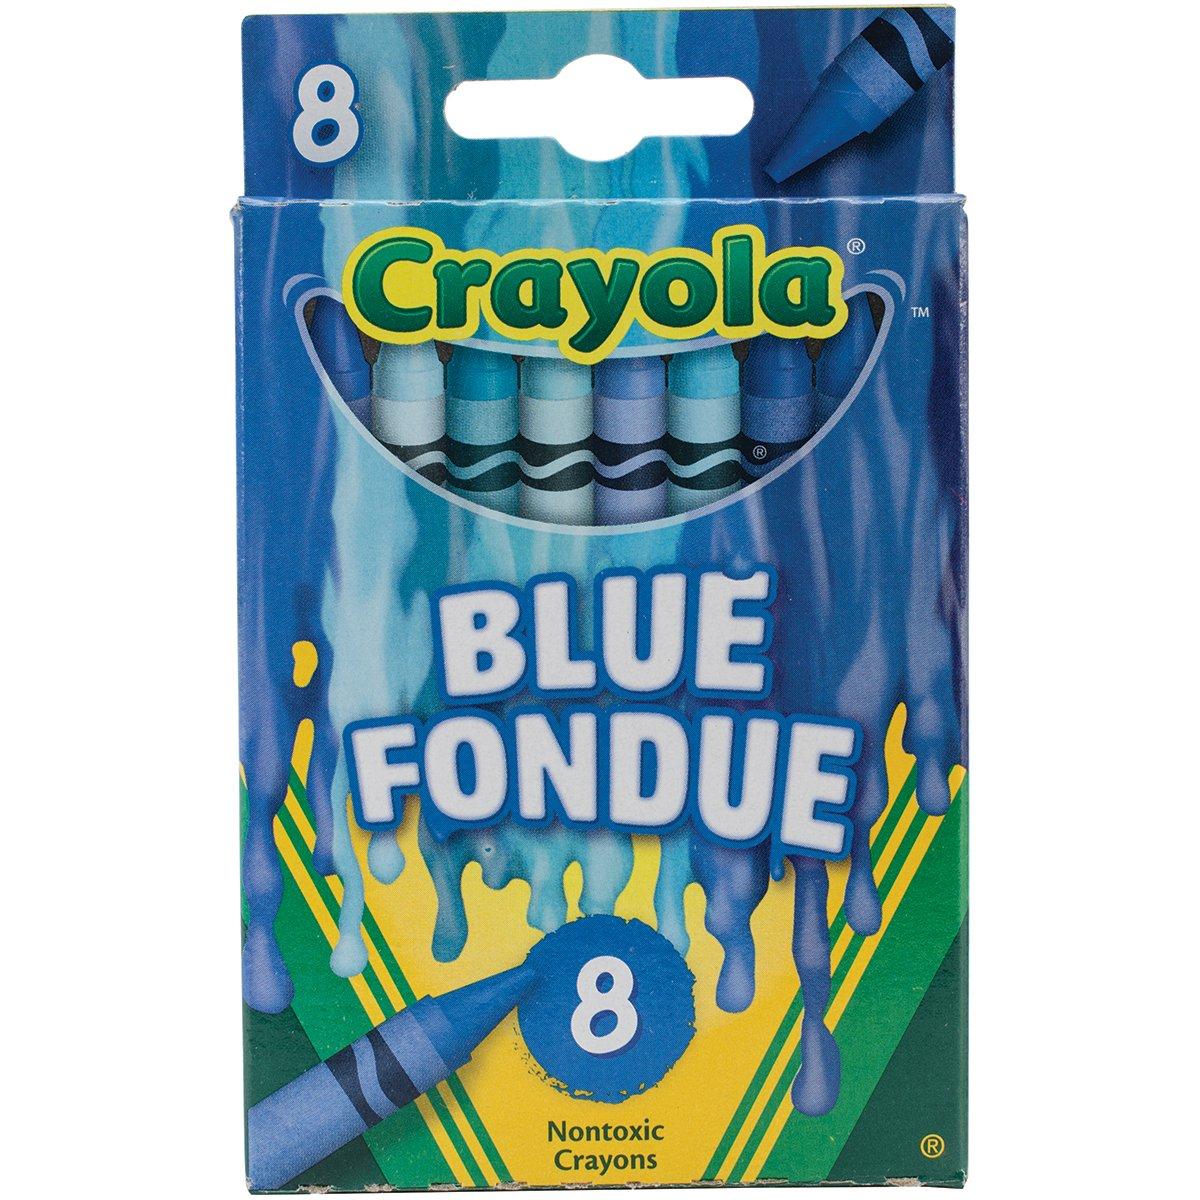 Crayola 5242-09A00 Meltdown Crayons, 8 Pack, Blue Fondue